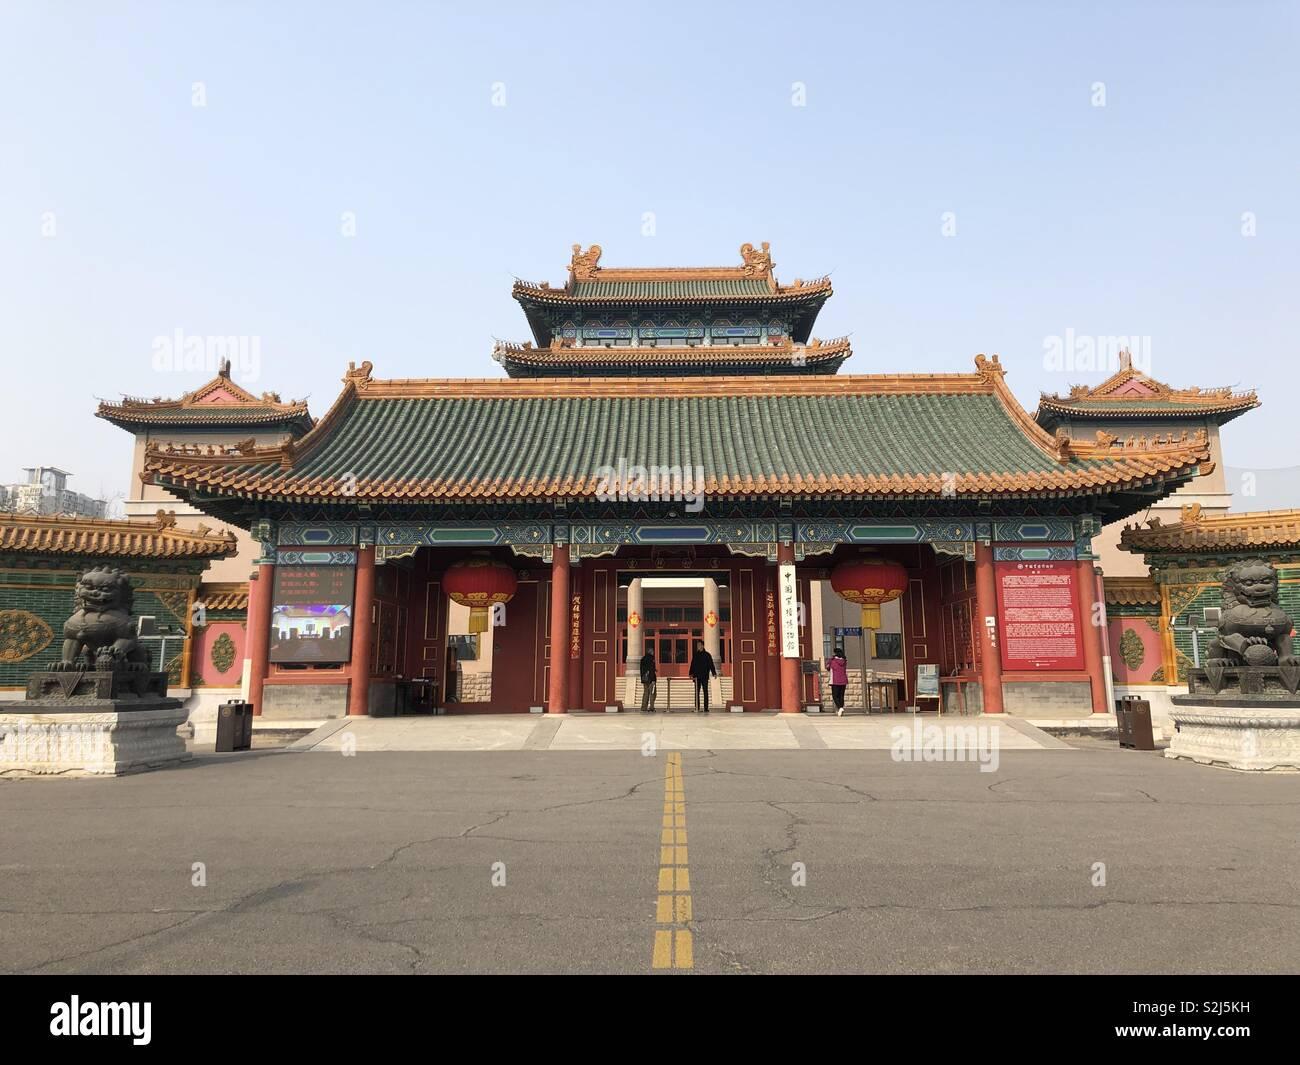 China Red Sandalwood Museum in Beijing